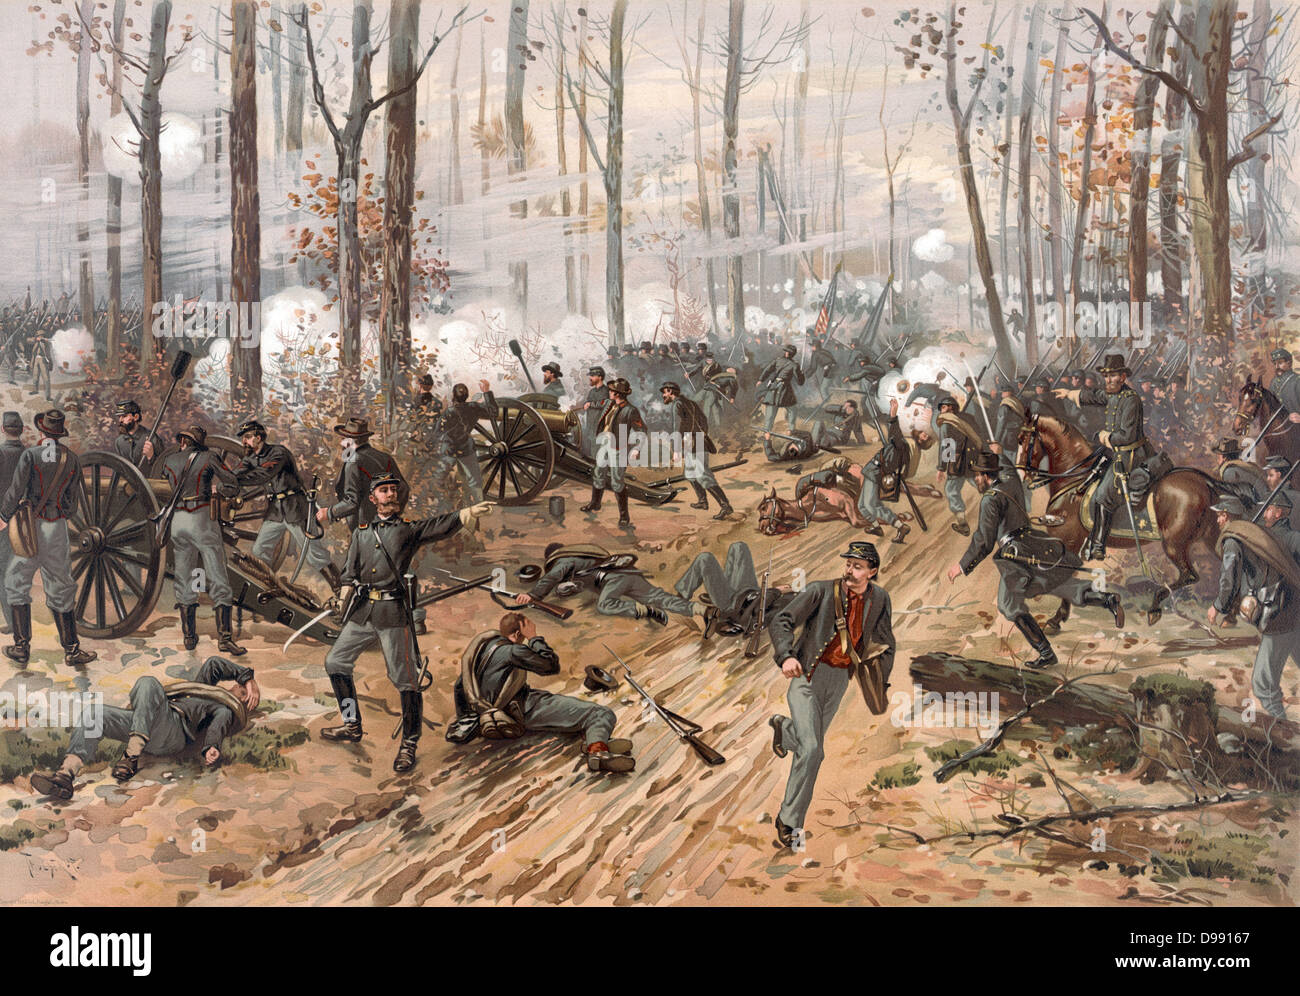 Battle of Shiloh (Battle of Pittsburgh Landing), Tennessee, 6-7 April 1862. Major battle in American Civil War 1861 - Stock Image